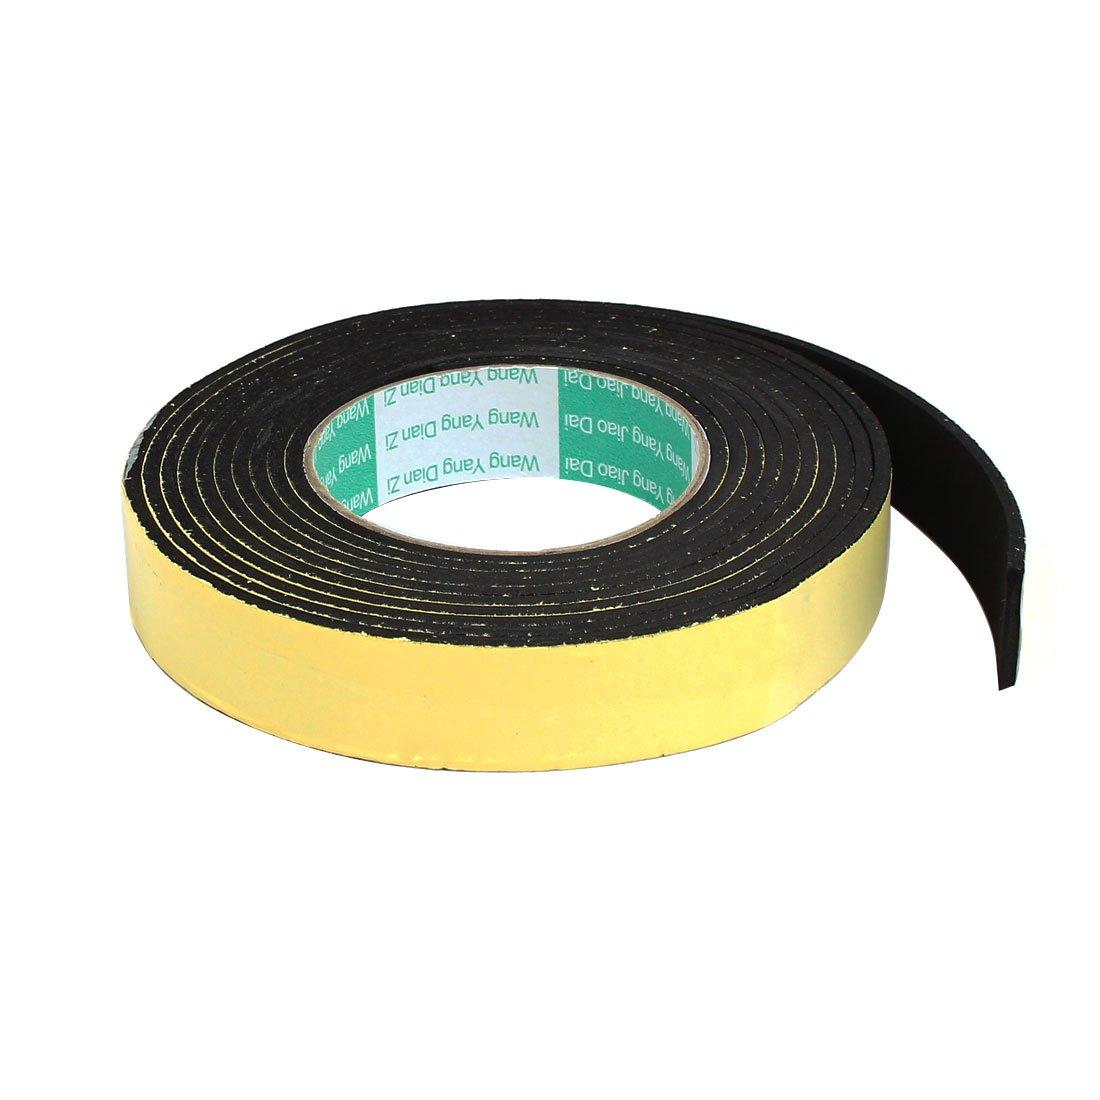 uxcell 25mmx3mm Single Sided Sponge Tape Adhesive Sticker Foam Glue Strip Sealing 4M 4336865092